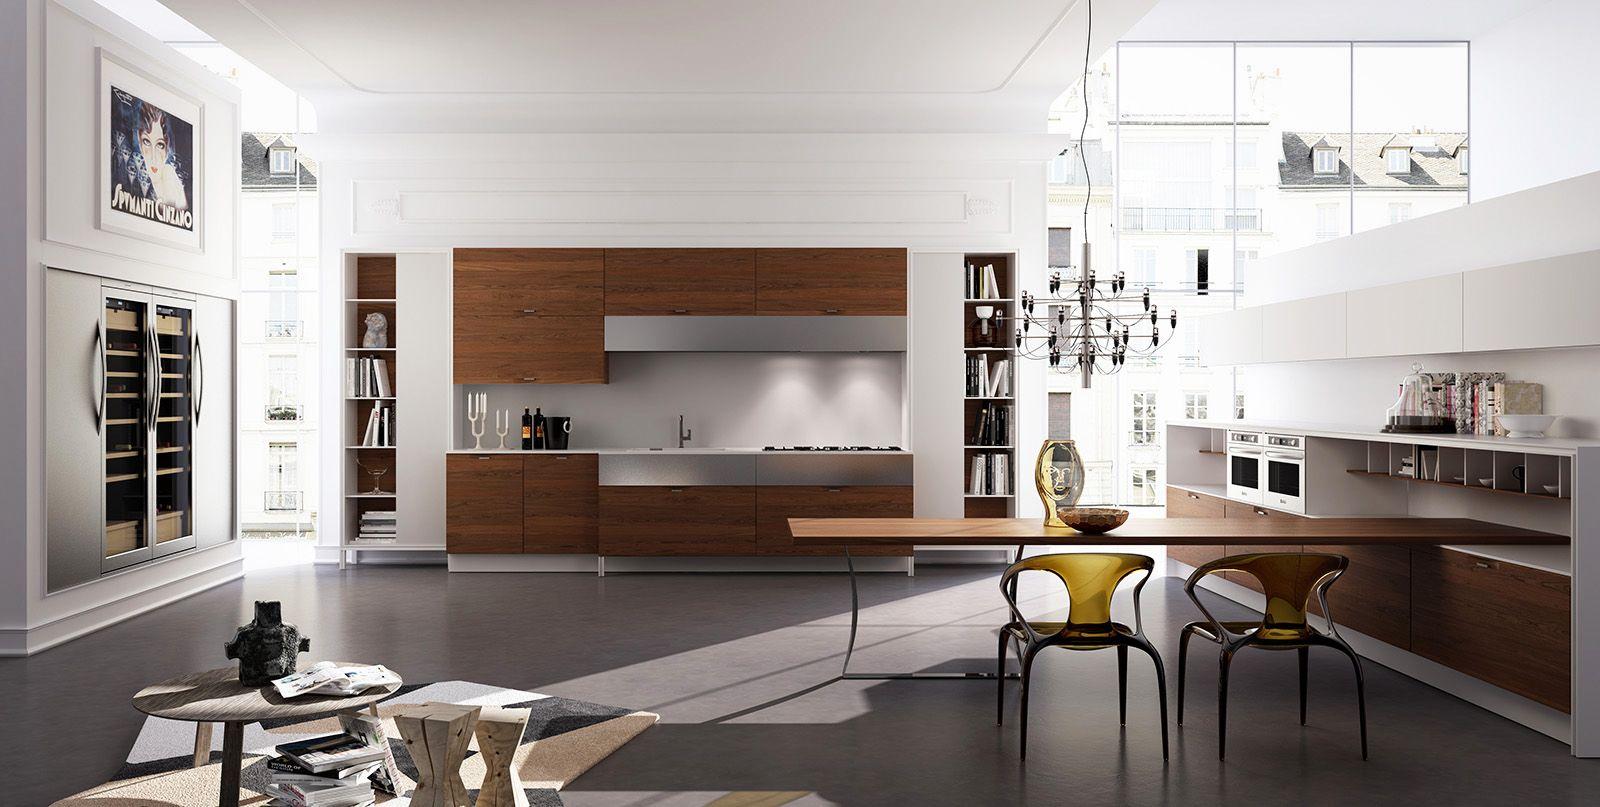 Novalinea U6 Studio _kitchen Pinterest Spaces And Kitchens # Muebles New Style Villa Tesei